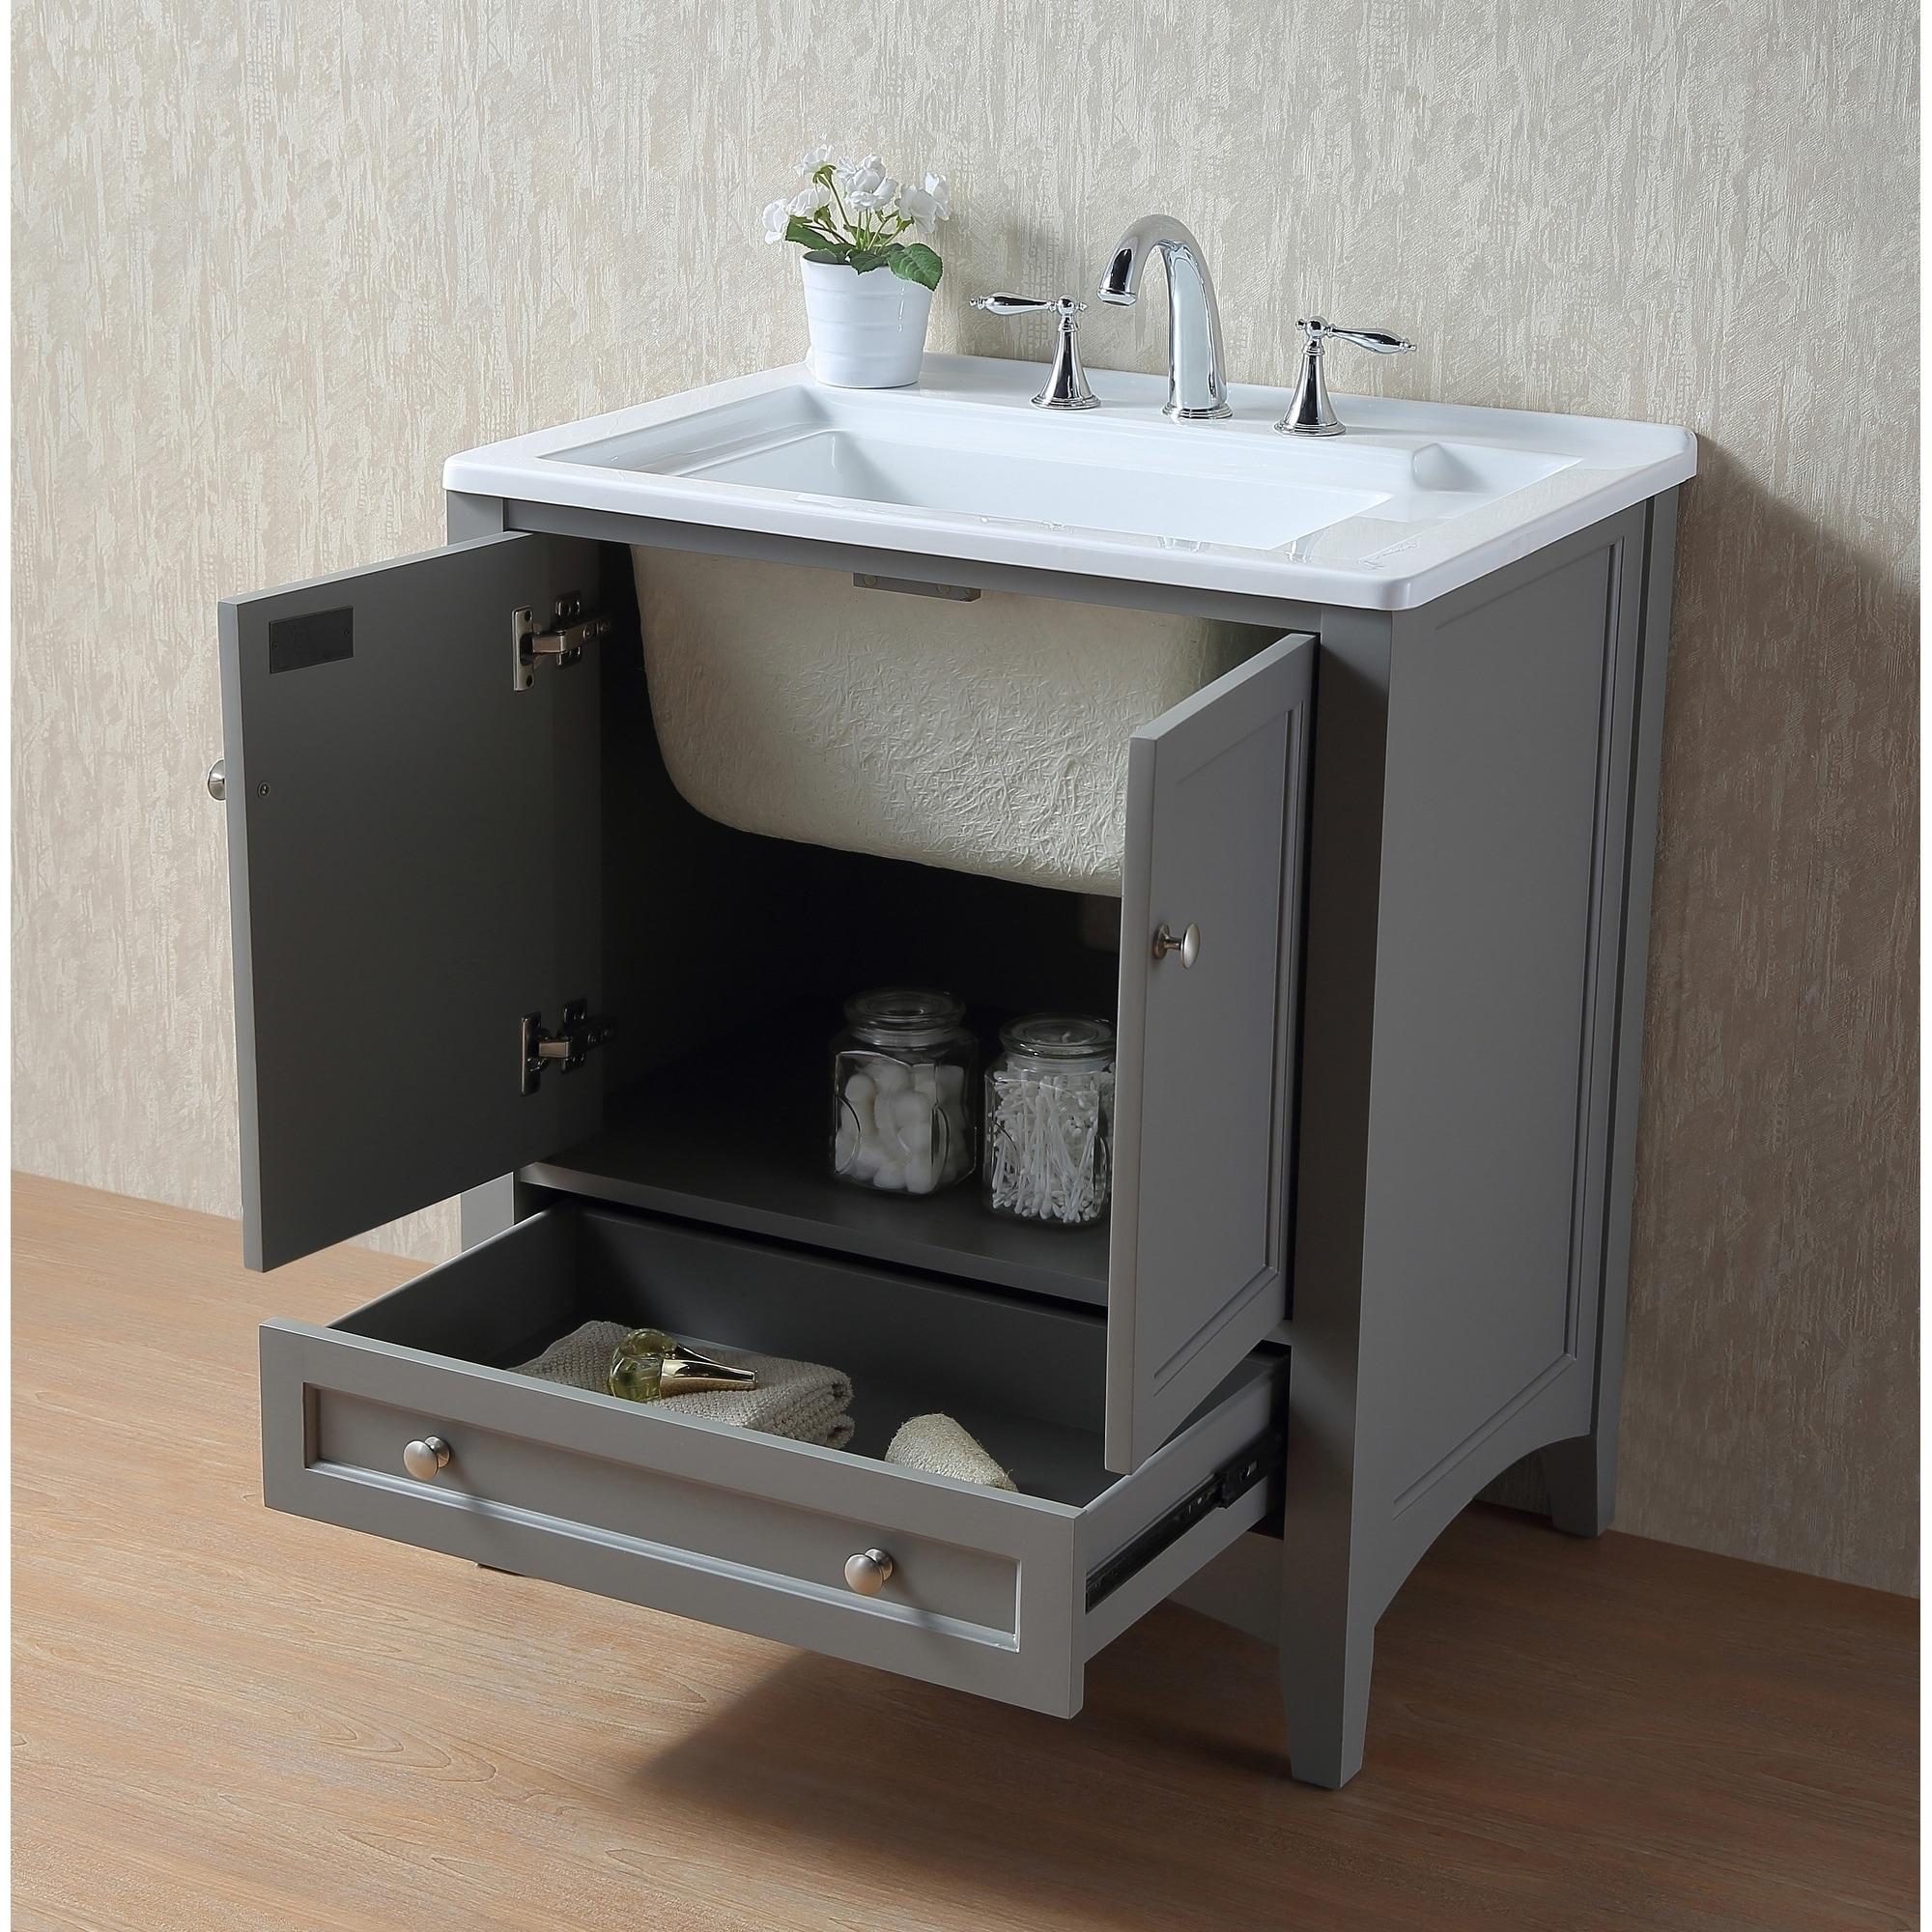 Shop Stufurhome 30 inch Grey Laundry Utility Sink - Free Shipping ...